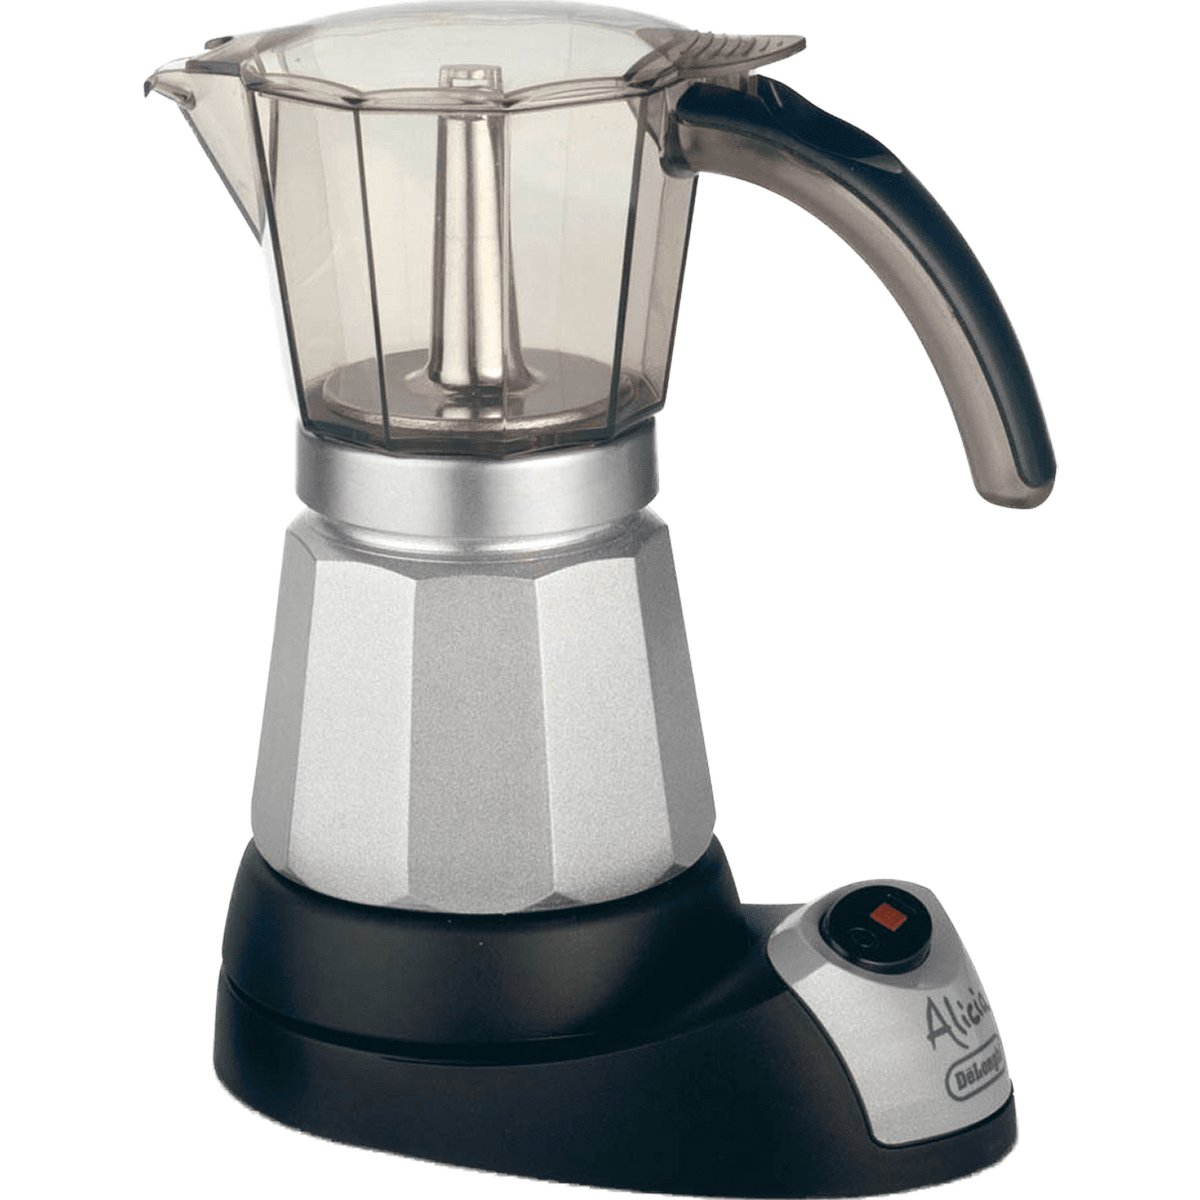 DeLonghi EMK6 Electric Moka Espresso Machine